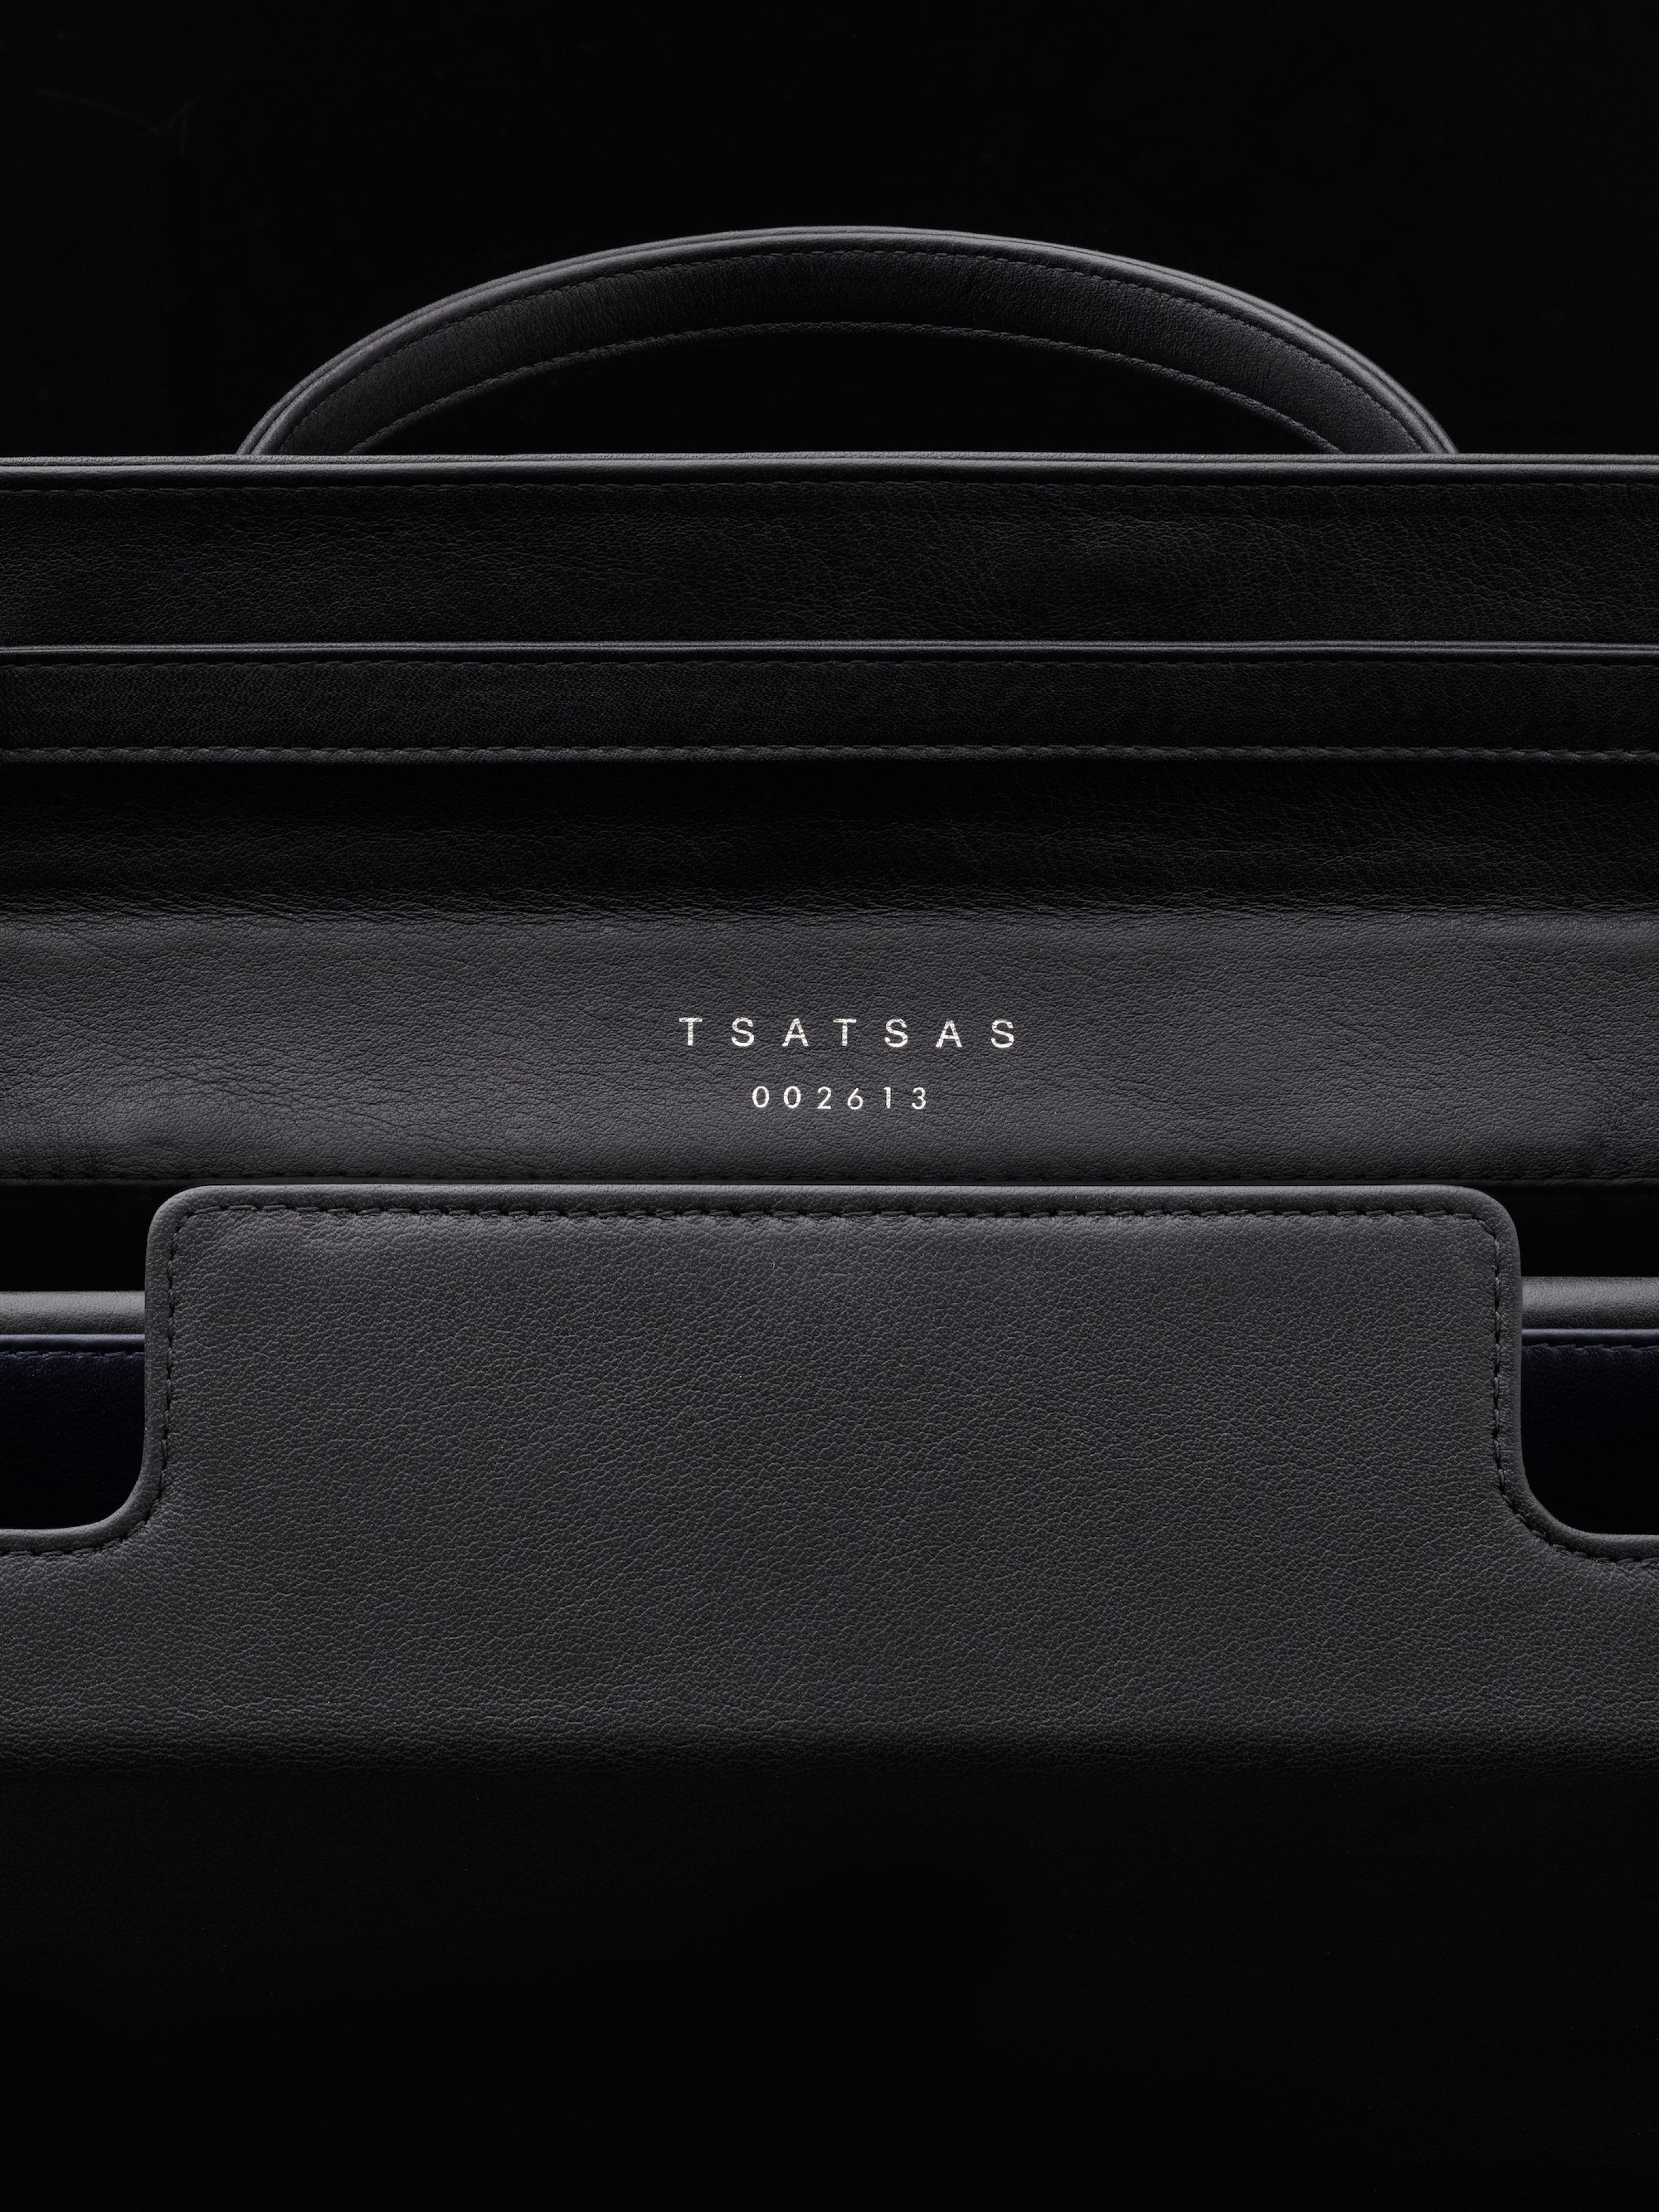 IGNANT-Design-Tsatsas-Dieter-Rams-931-007